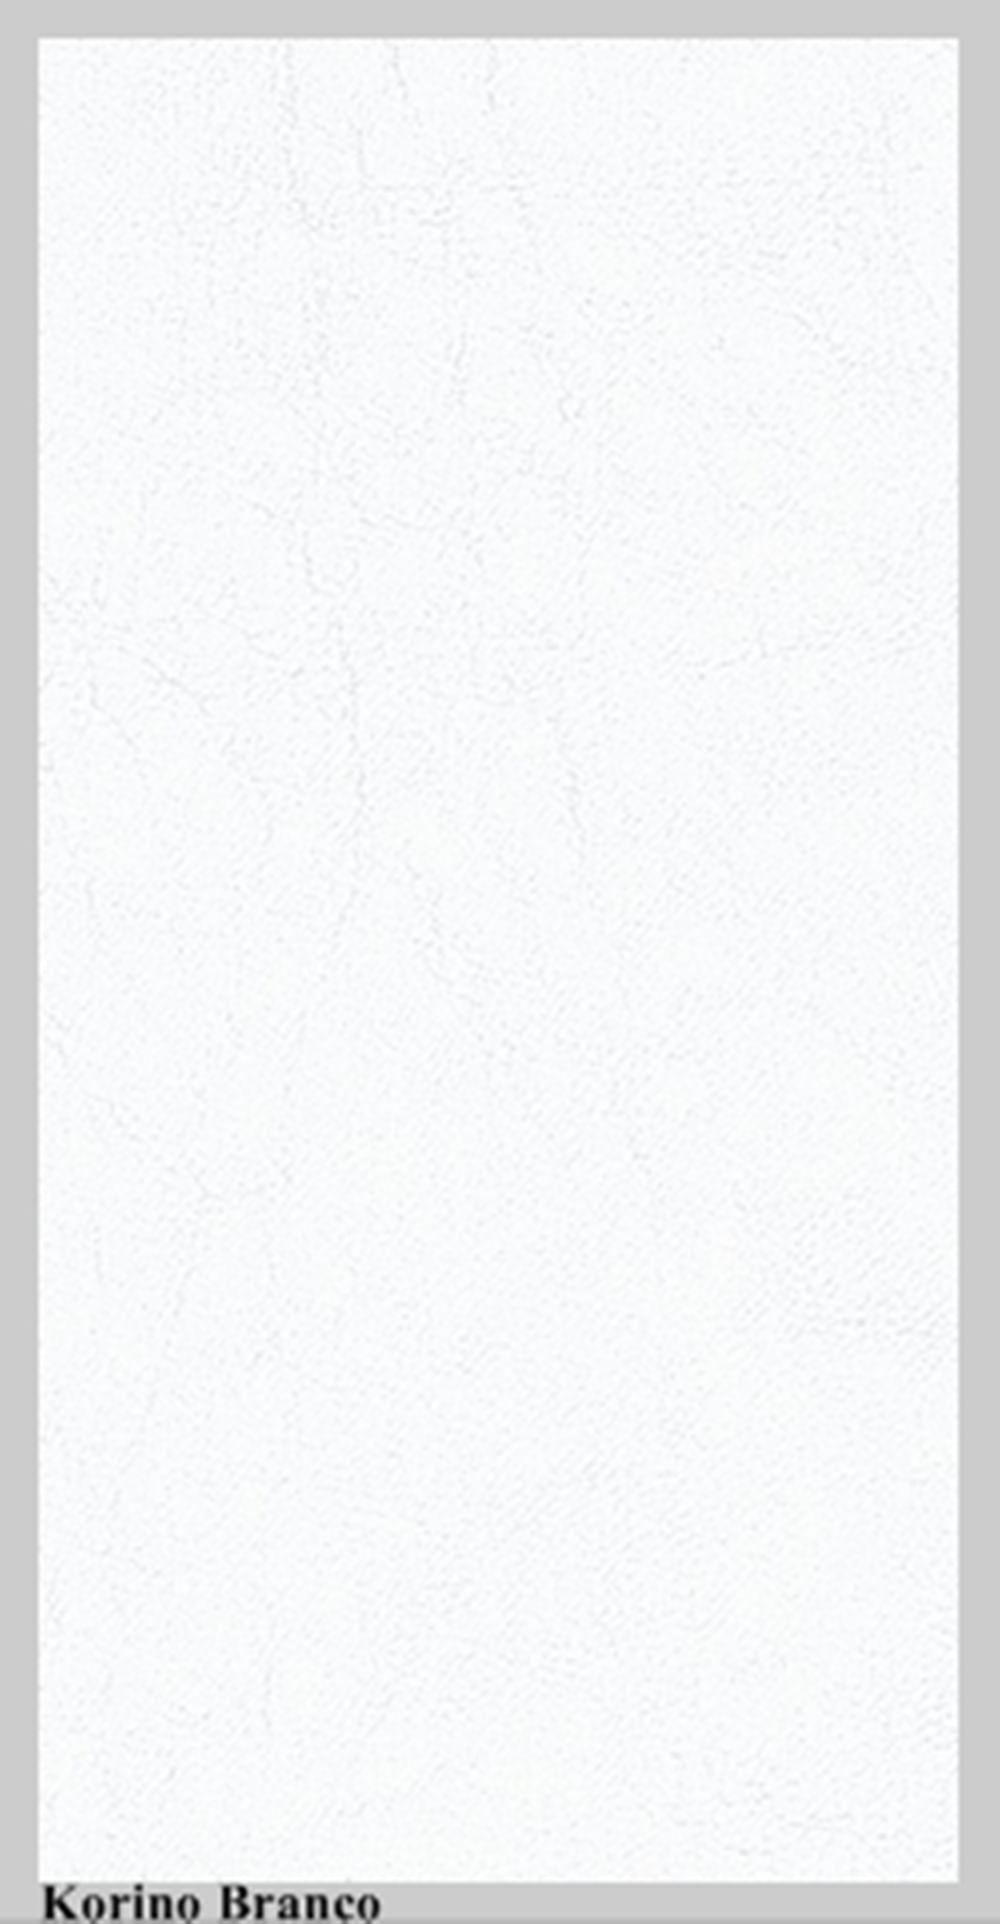 Cadeira Estofada Korino Branco 12248